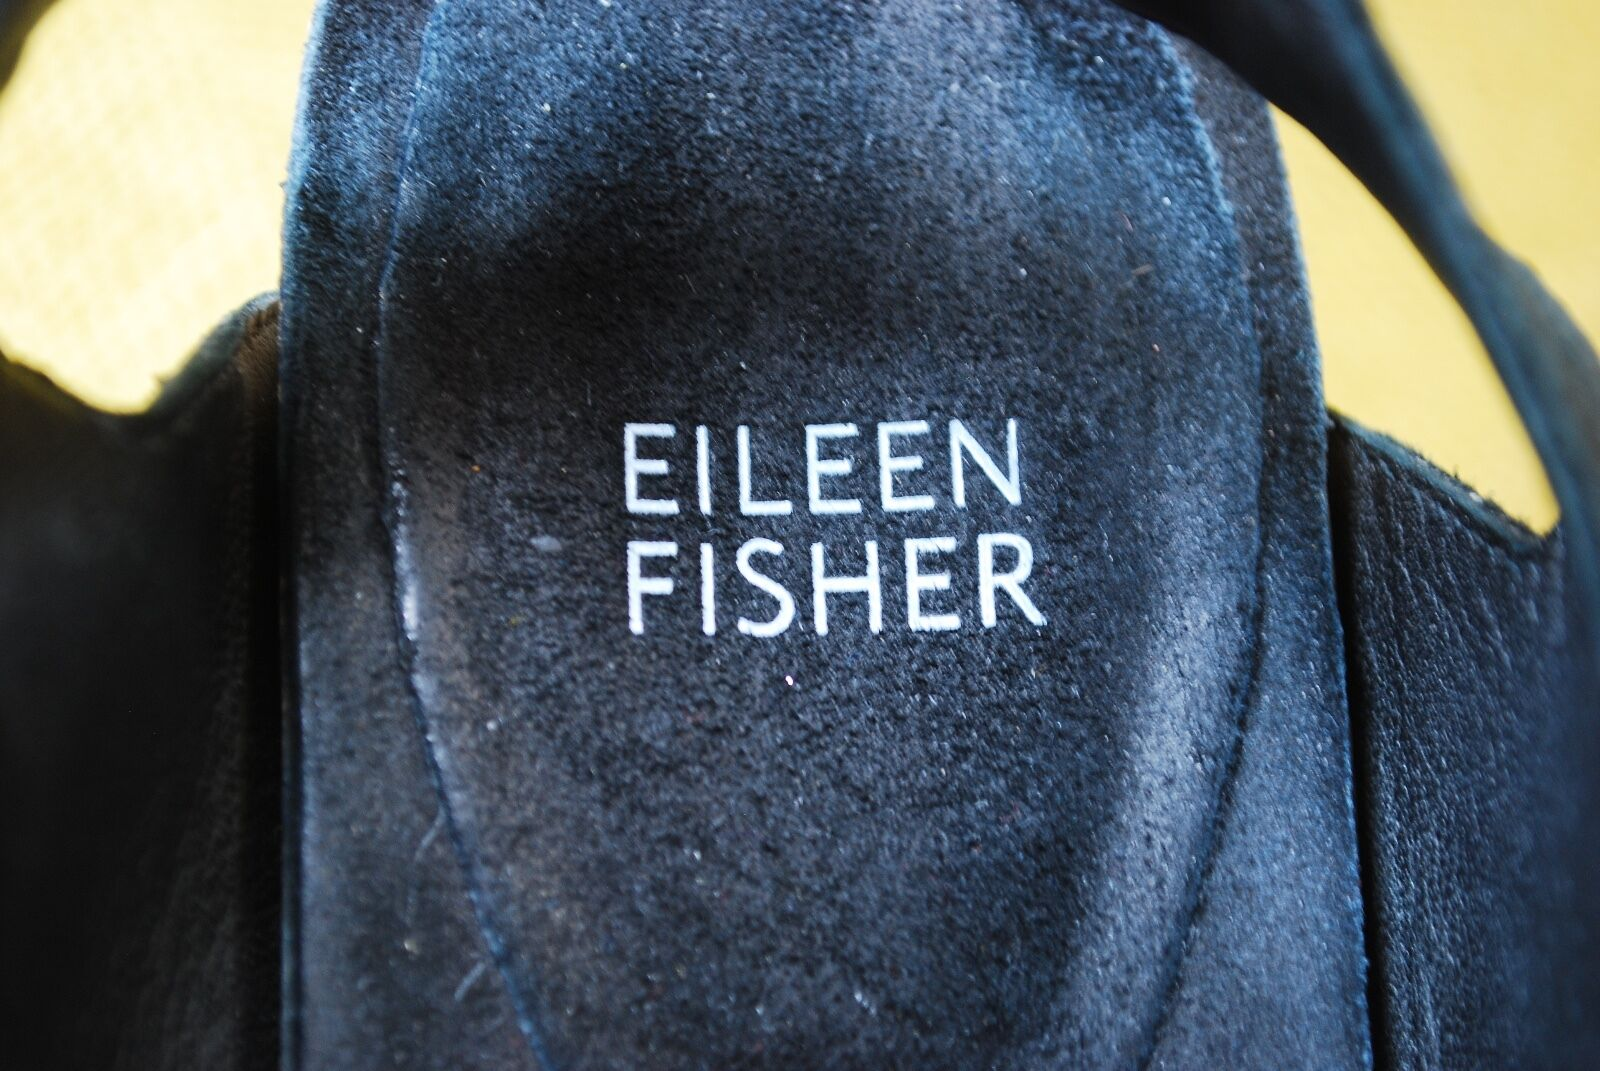 Eileen Fisher Peep Punta Abierta Botines Sandalias De Cuero Nobuck Nobuck Nobuck Negro Taco de 3.5  Talle 10 282c6e